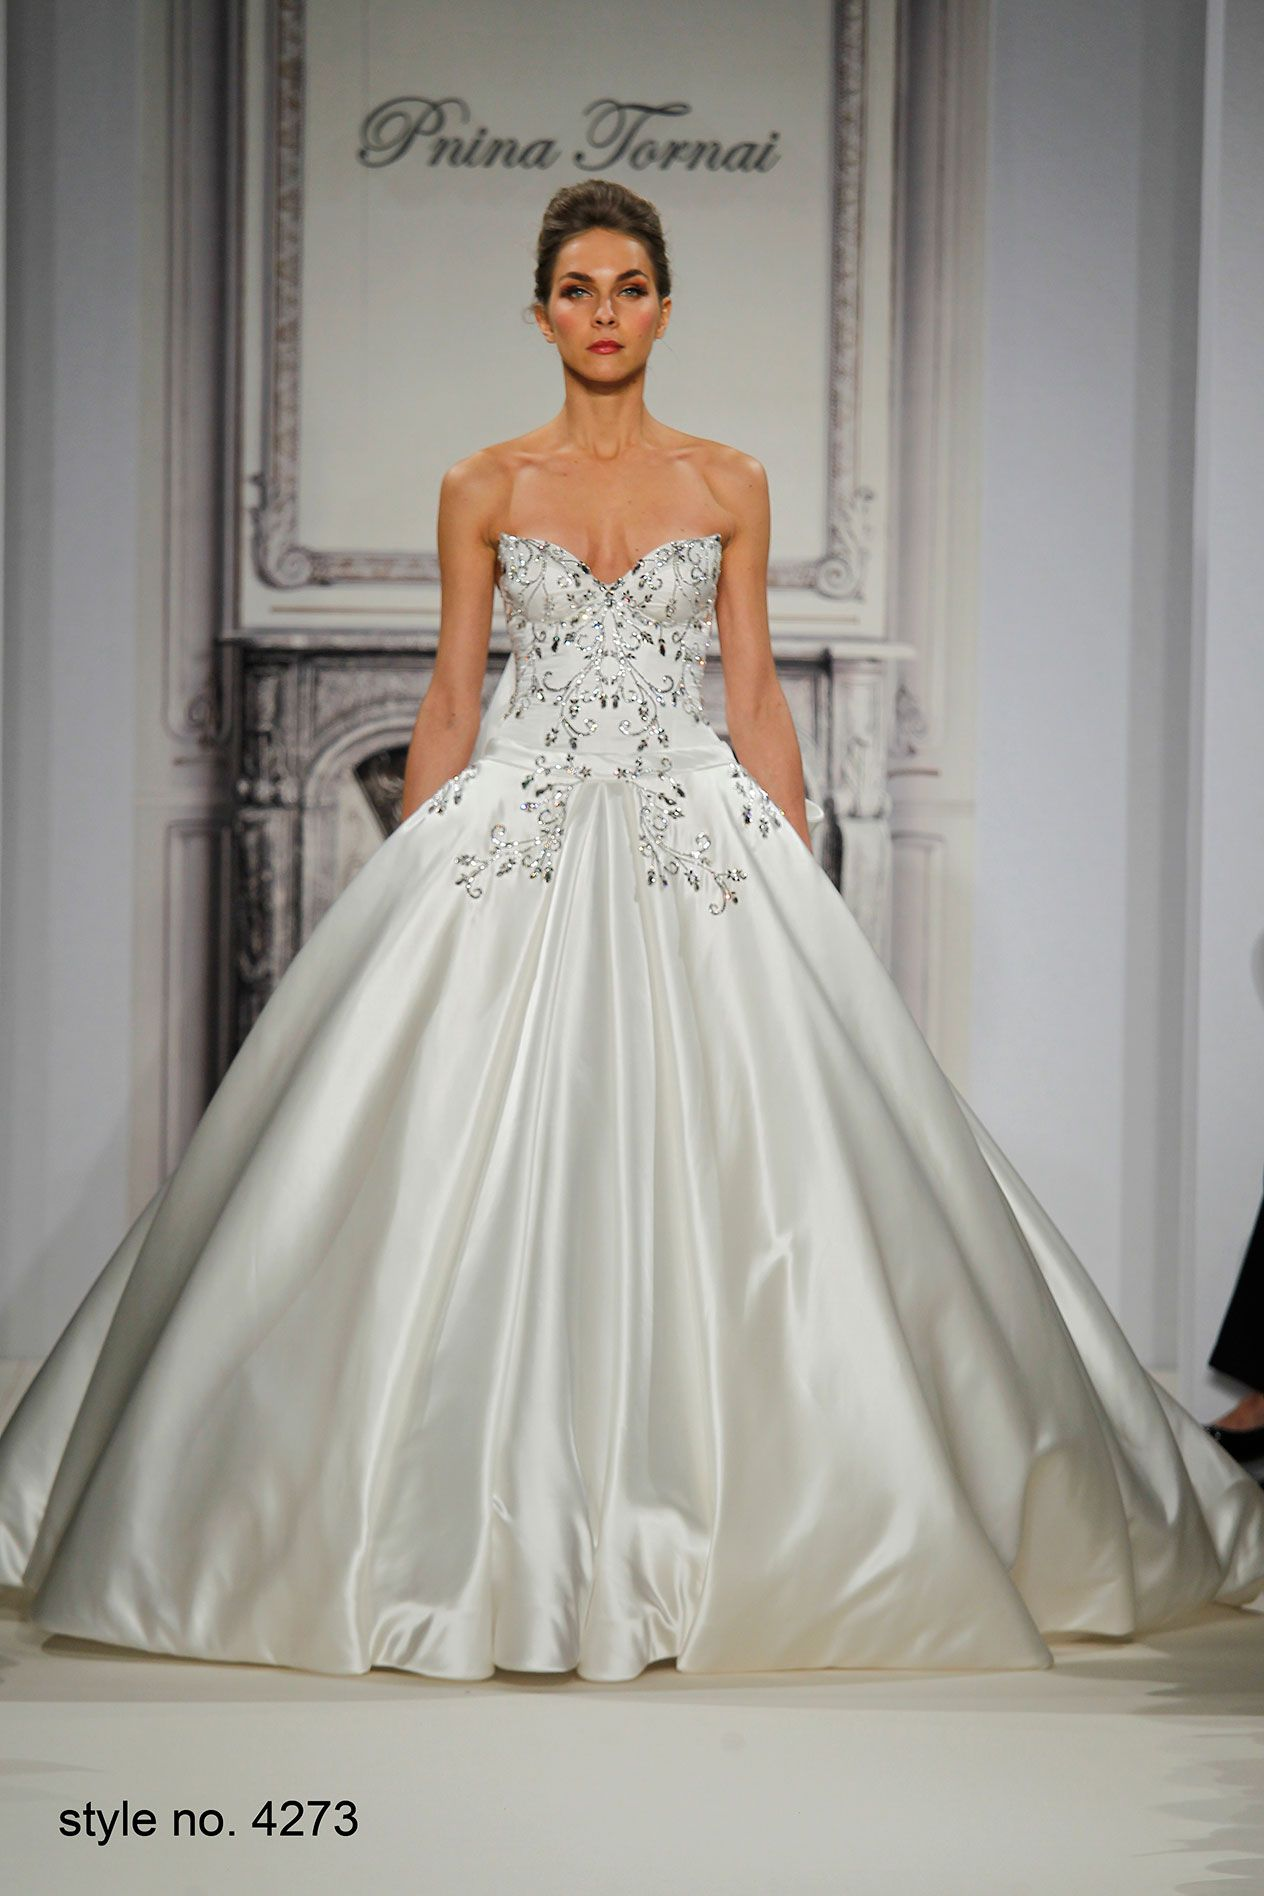 Pnina Tornai Style 4273 Pninatornai Ball Gown Wedding Dress Ball Dresses Wedding Dresses